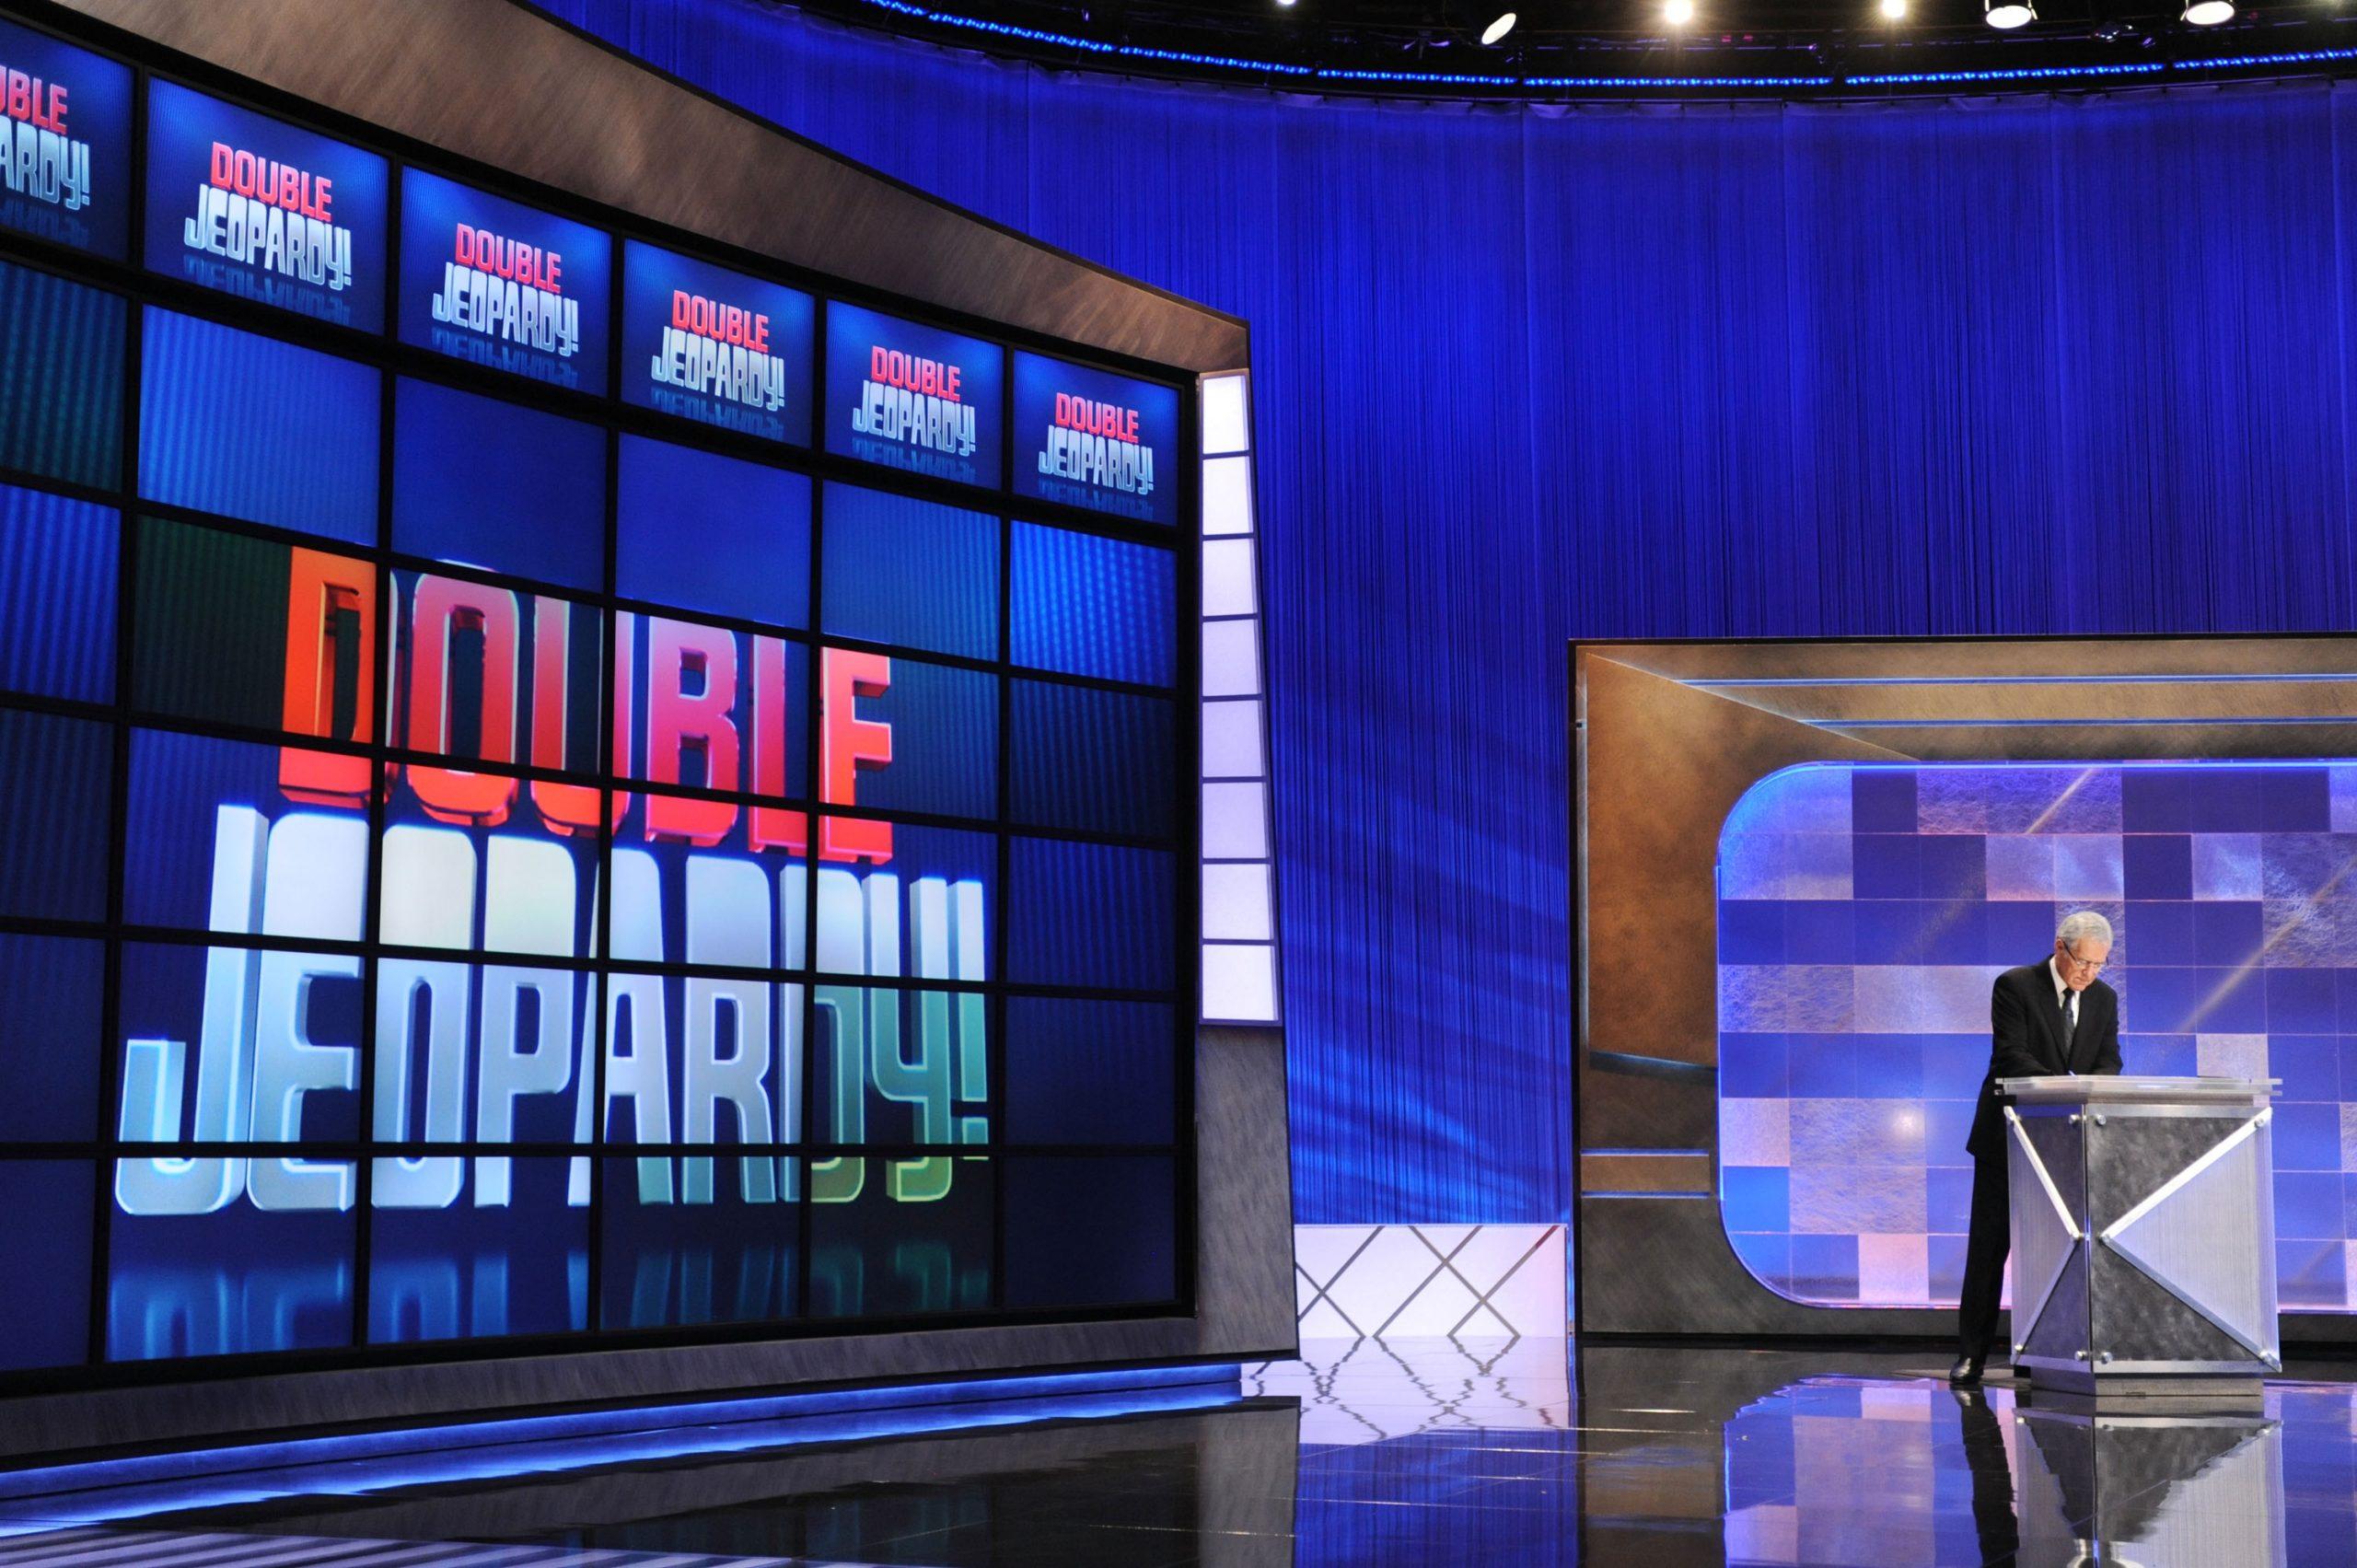 The 'Jeopardy!' quiz show board